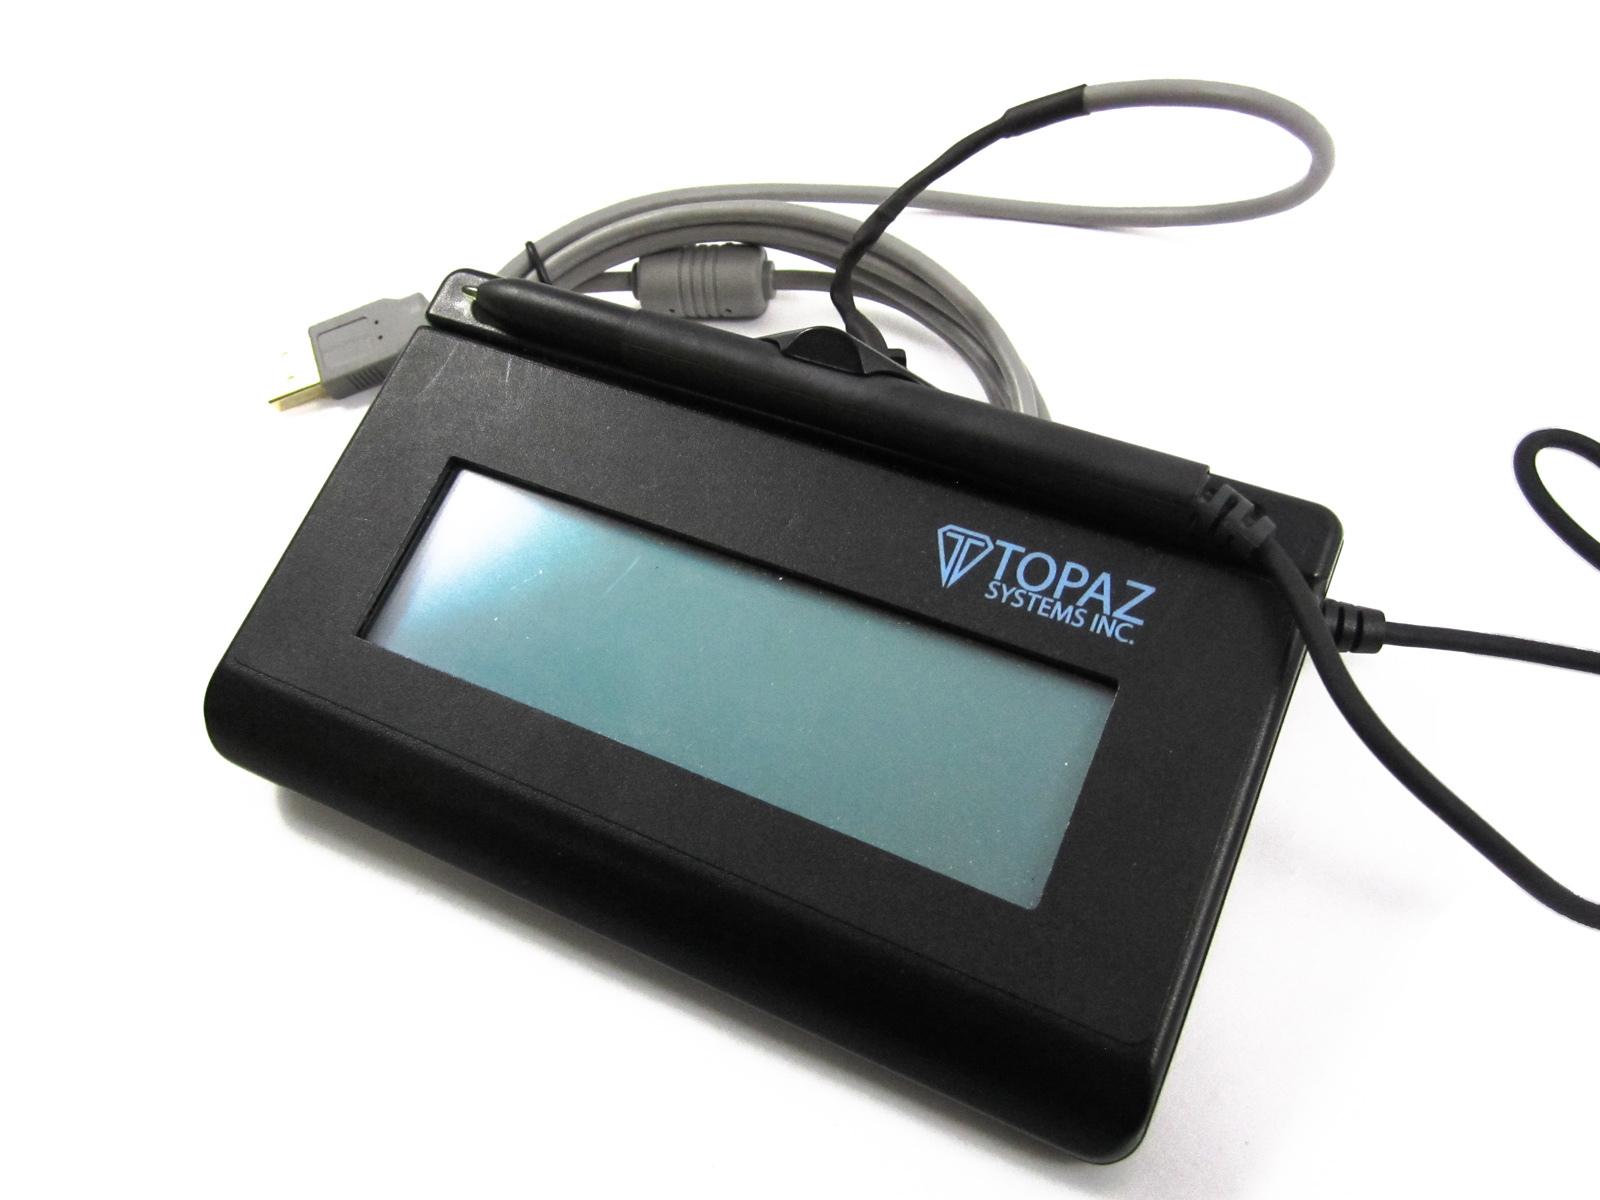 T-LBK462-BSB-R Topaz 1X5 Backlit LCD Signature Reader Capture Pad - 2-3 day Ship